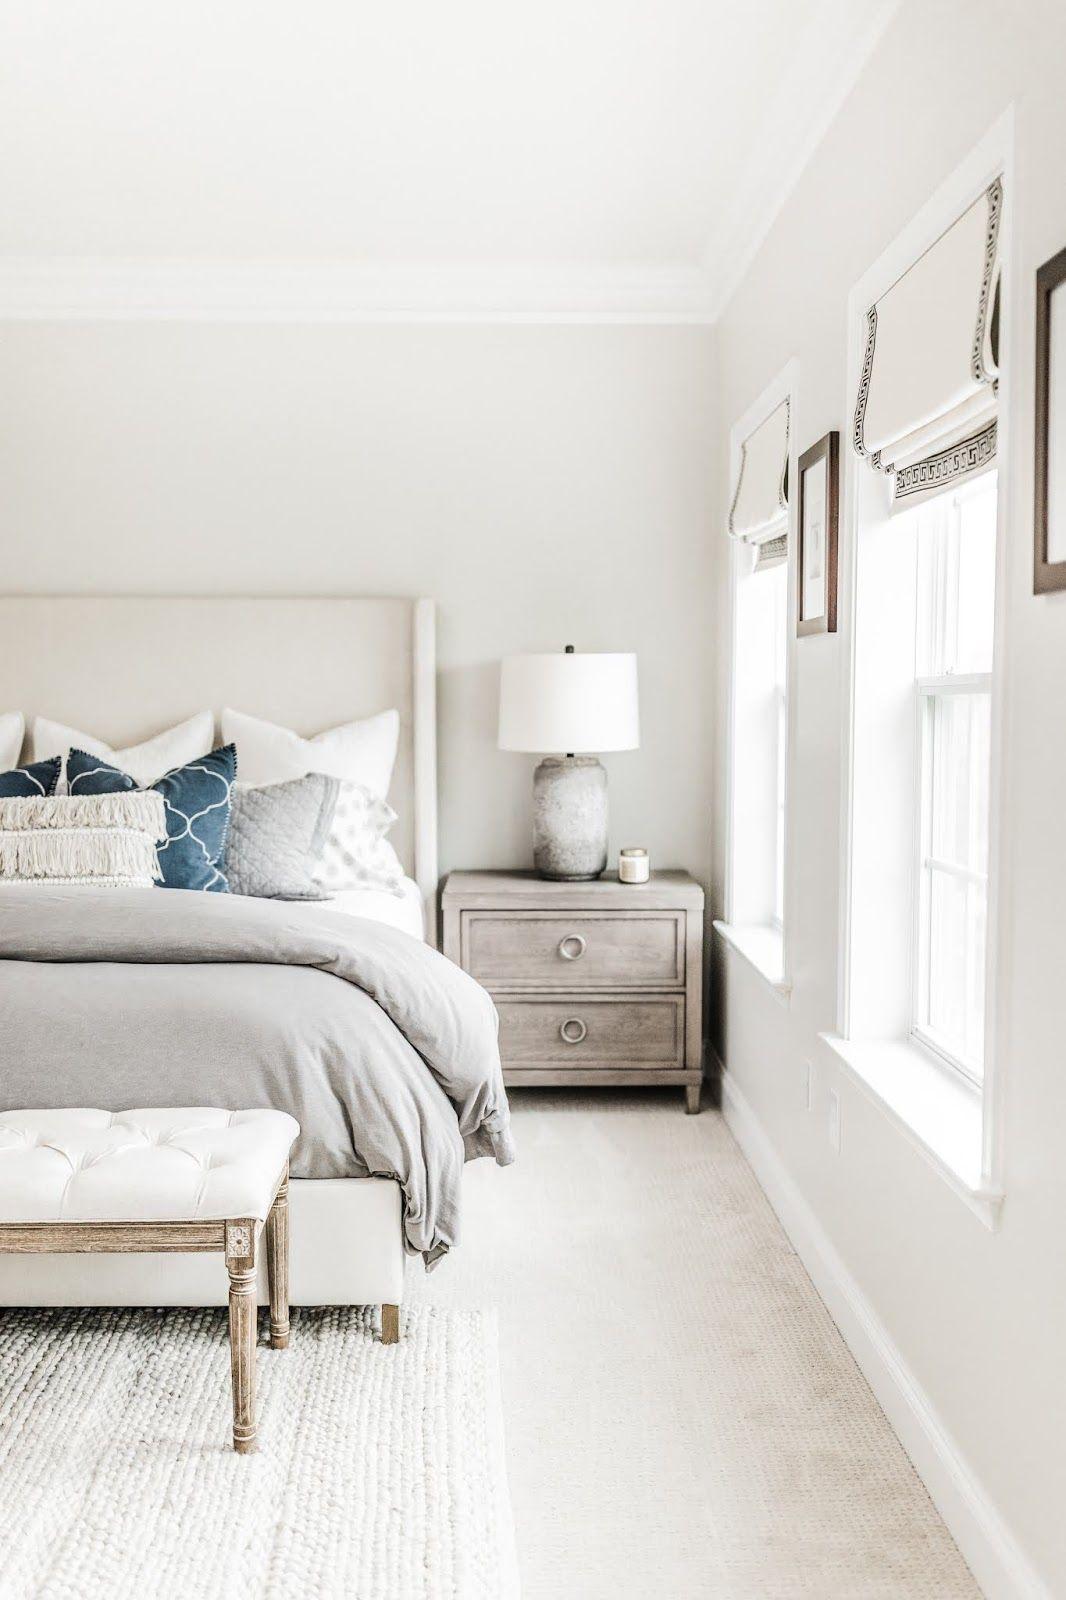 Wilsons Co Master Bedroom Reveal Bassett Furniture This Post Is Sponsored By Bassett Furniture Master Bedrooms Decor Bassett Furniture Bedroom Interior